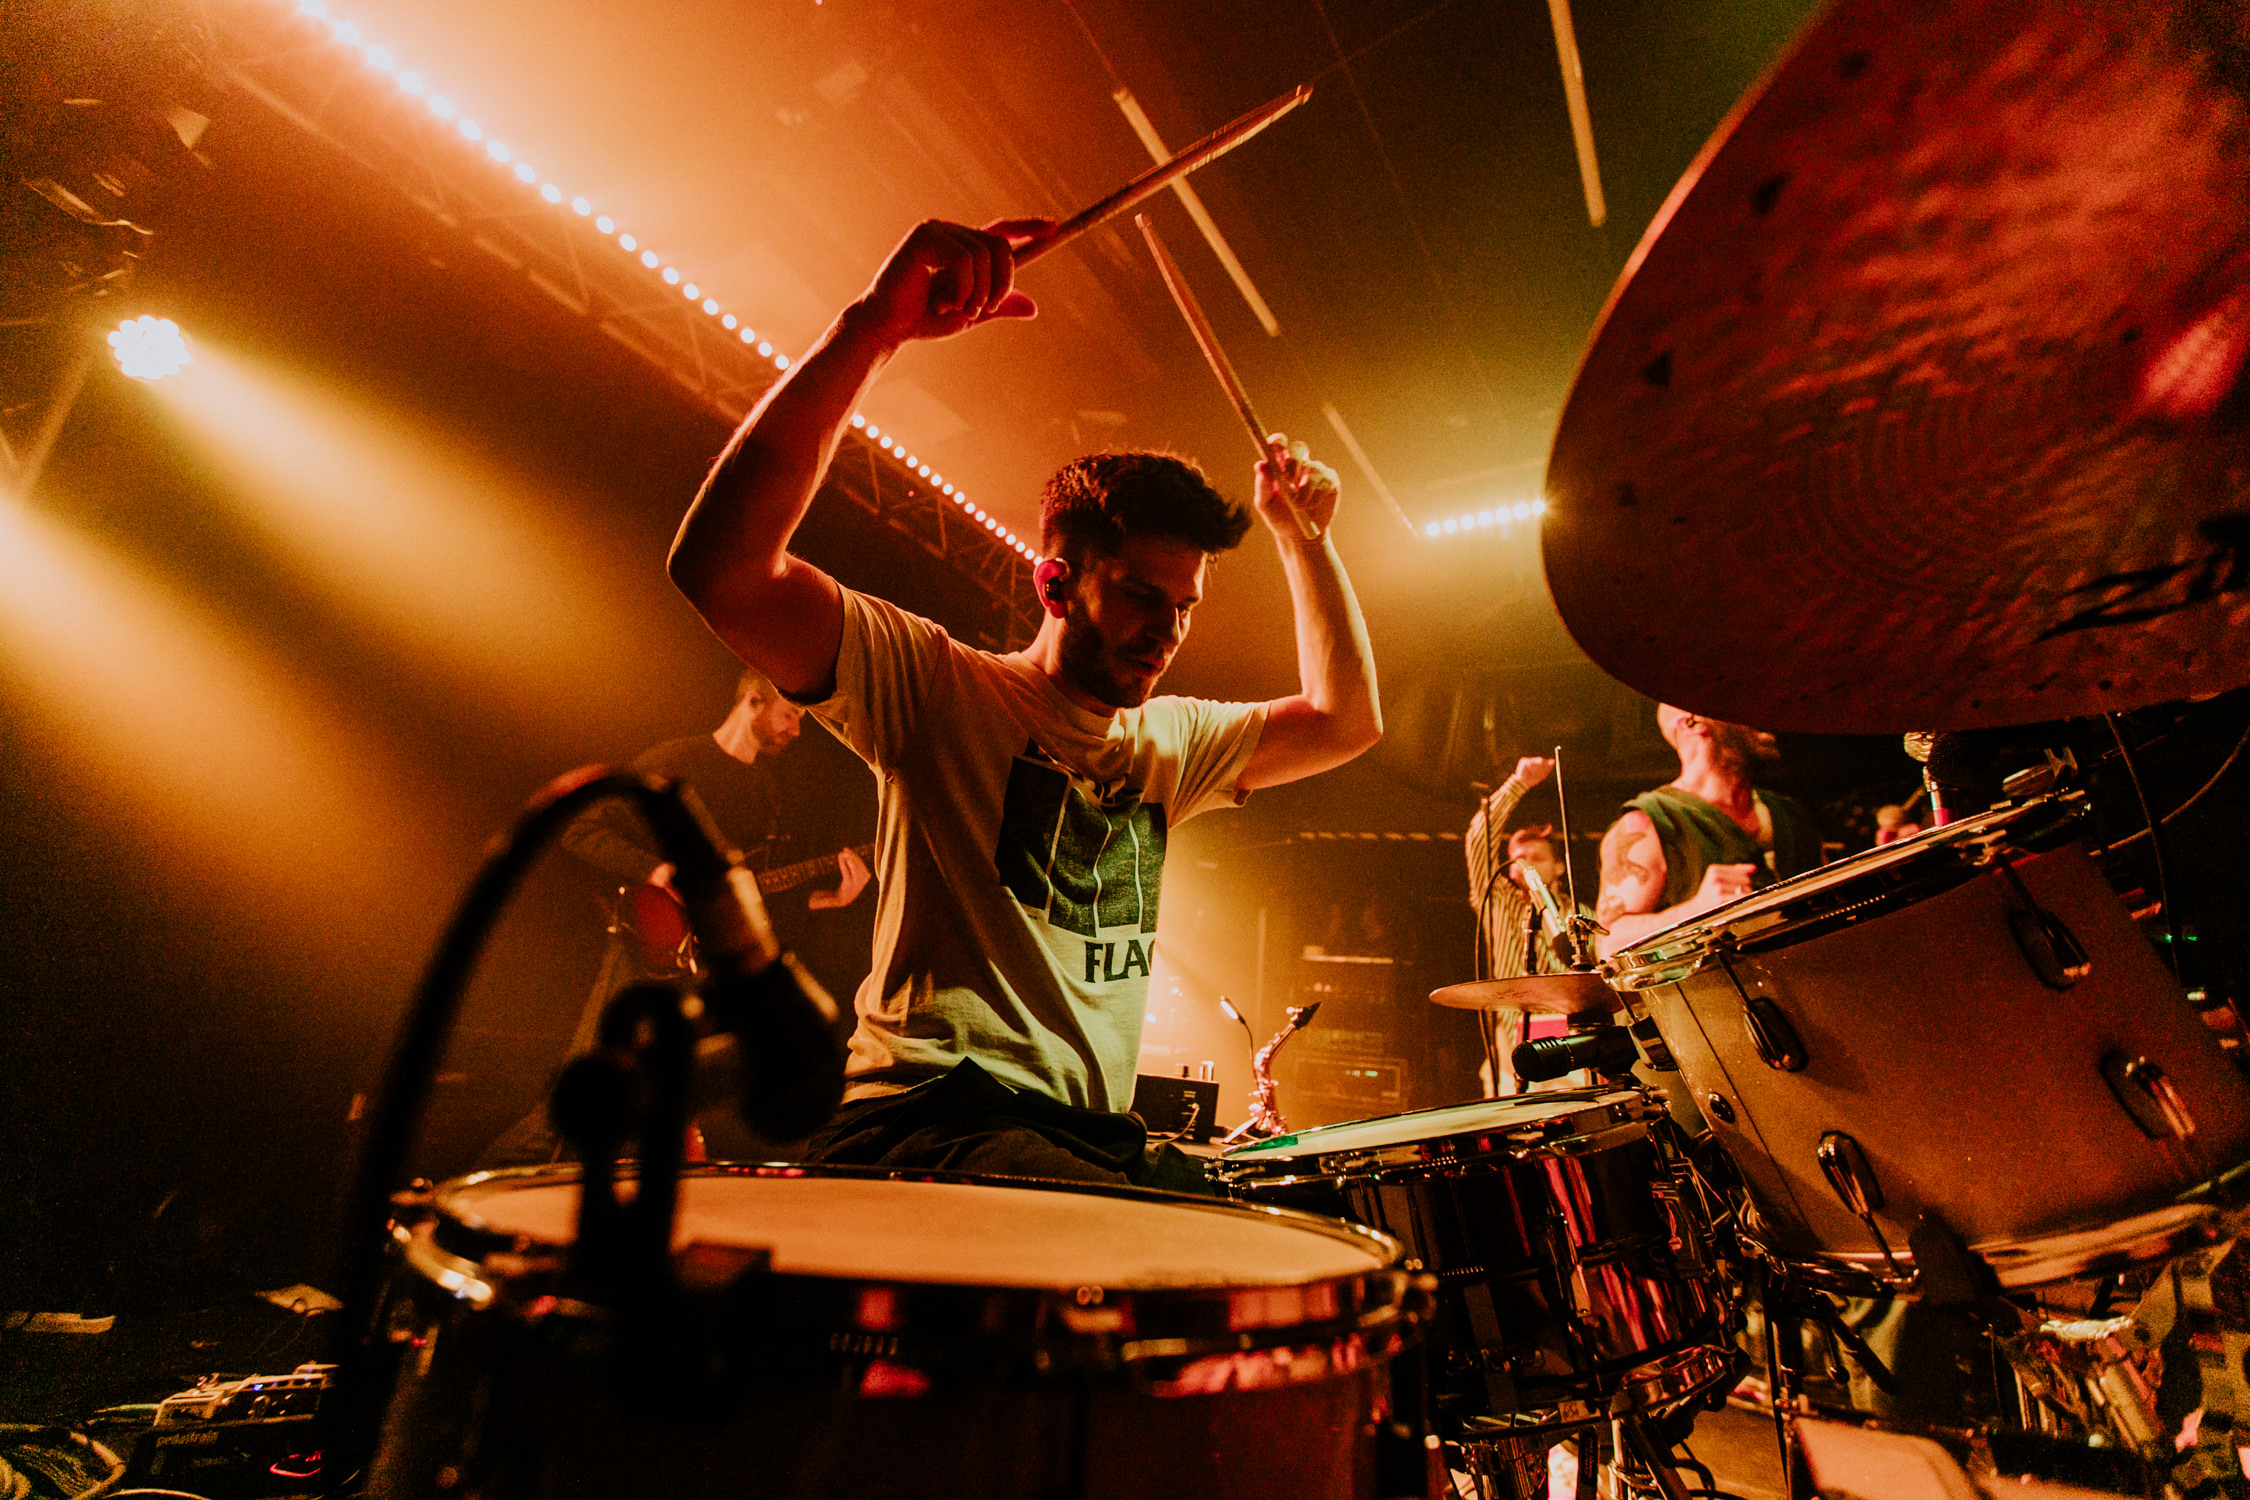 adam-levin-drums-action-shot-concert-AnnaLeeMedia